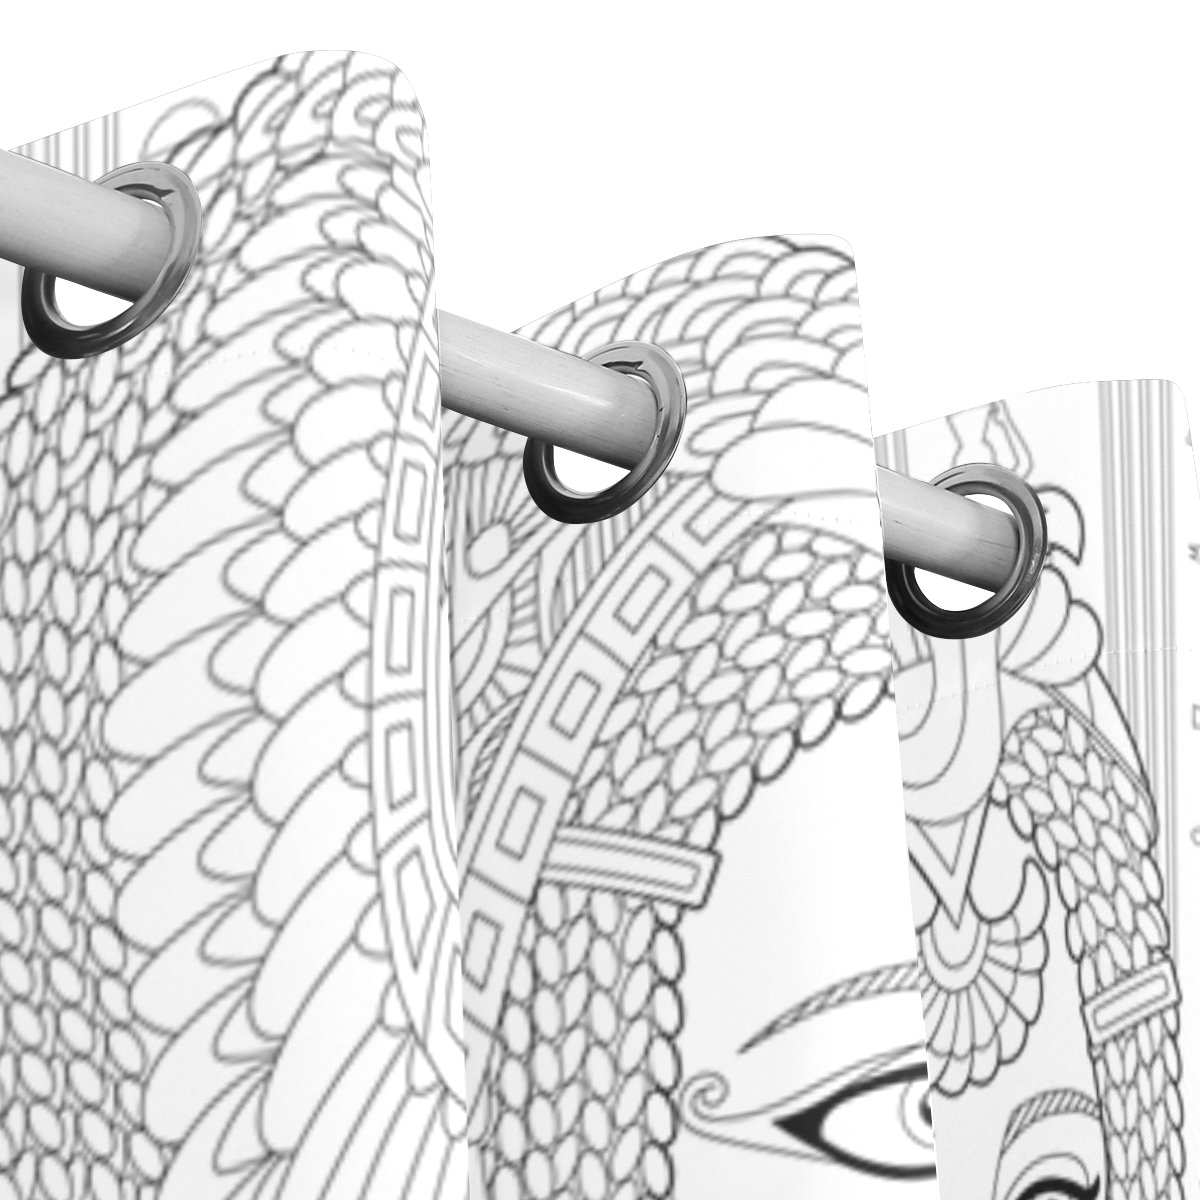 JSTEL - Cortinas de tutankhamen de estilo antiguo Pharaoh Queen Cleopatra, paneles de cortinas oscurecimiento opacos, separador de habitación, para patio, ventana, puerta corredera de cristal, 140 x 213 cm, juego de